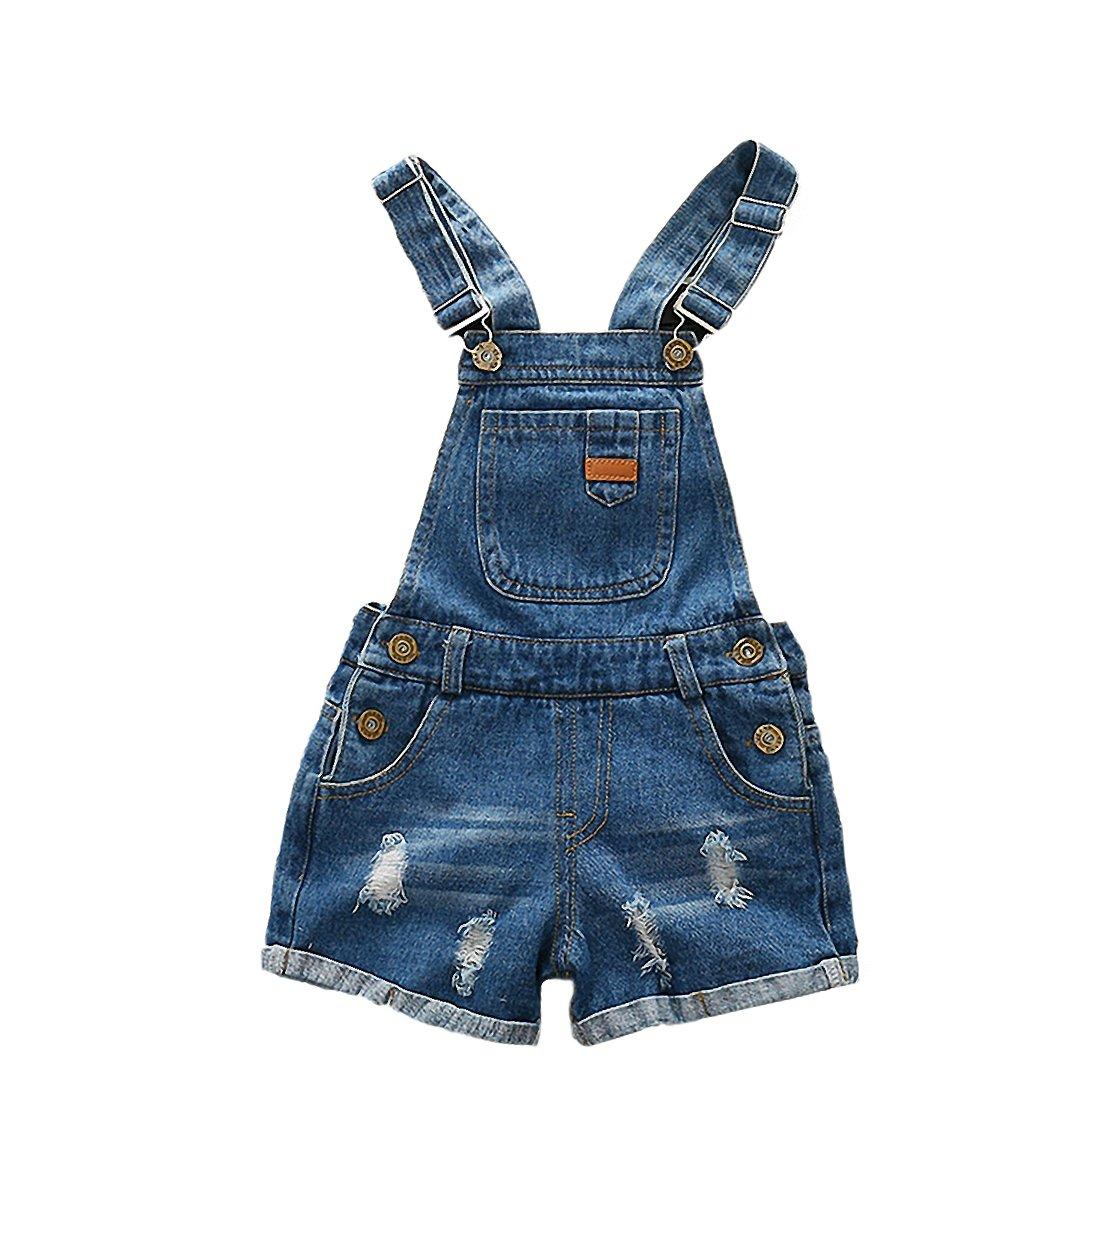 Kidscool Girls/Boys Big Bib Ripped Jeans Summer Shortall,Blue,7-8 Years